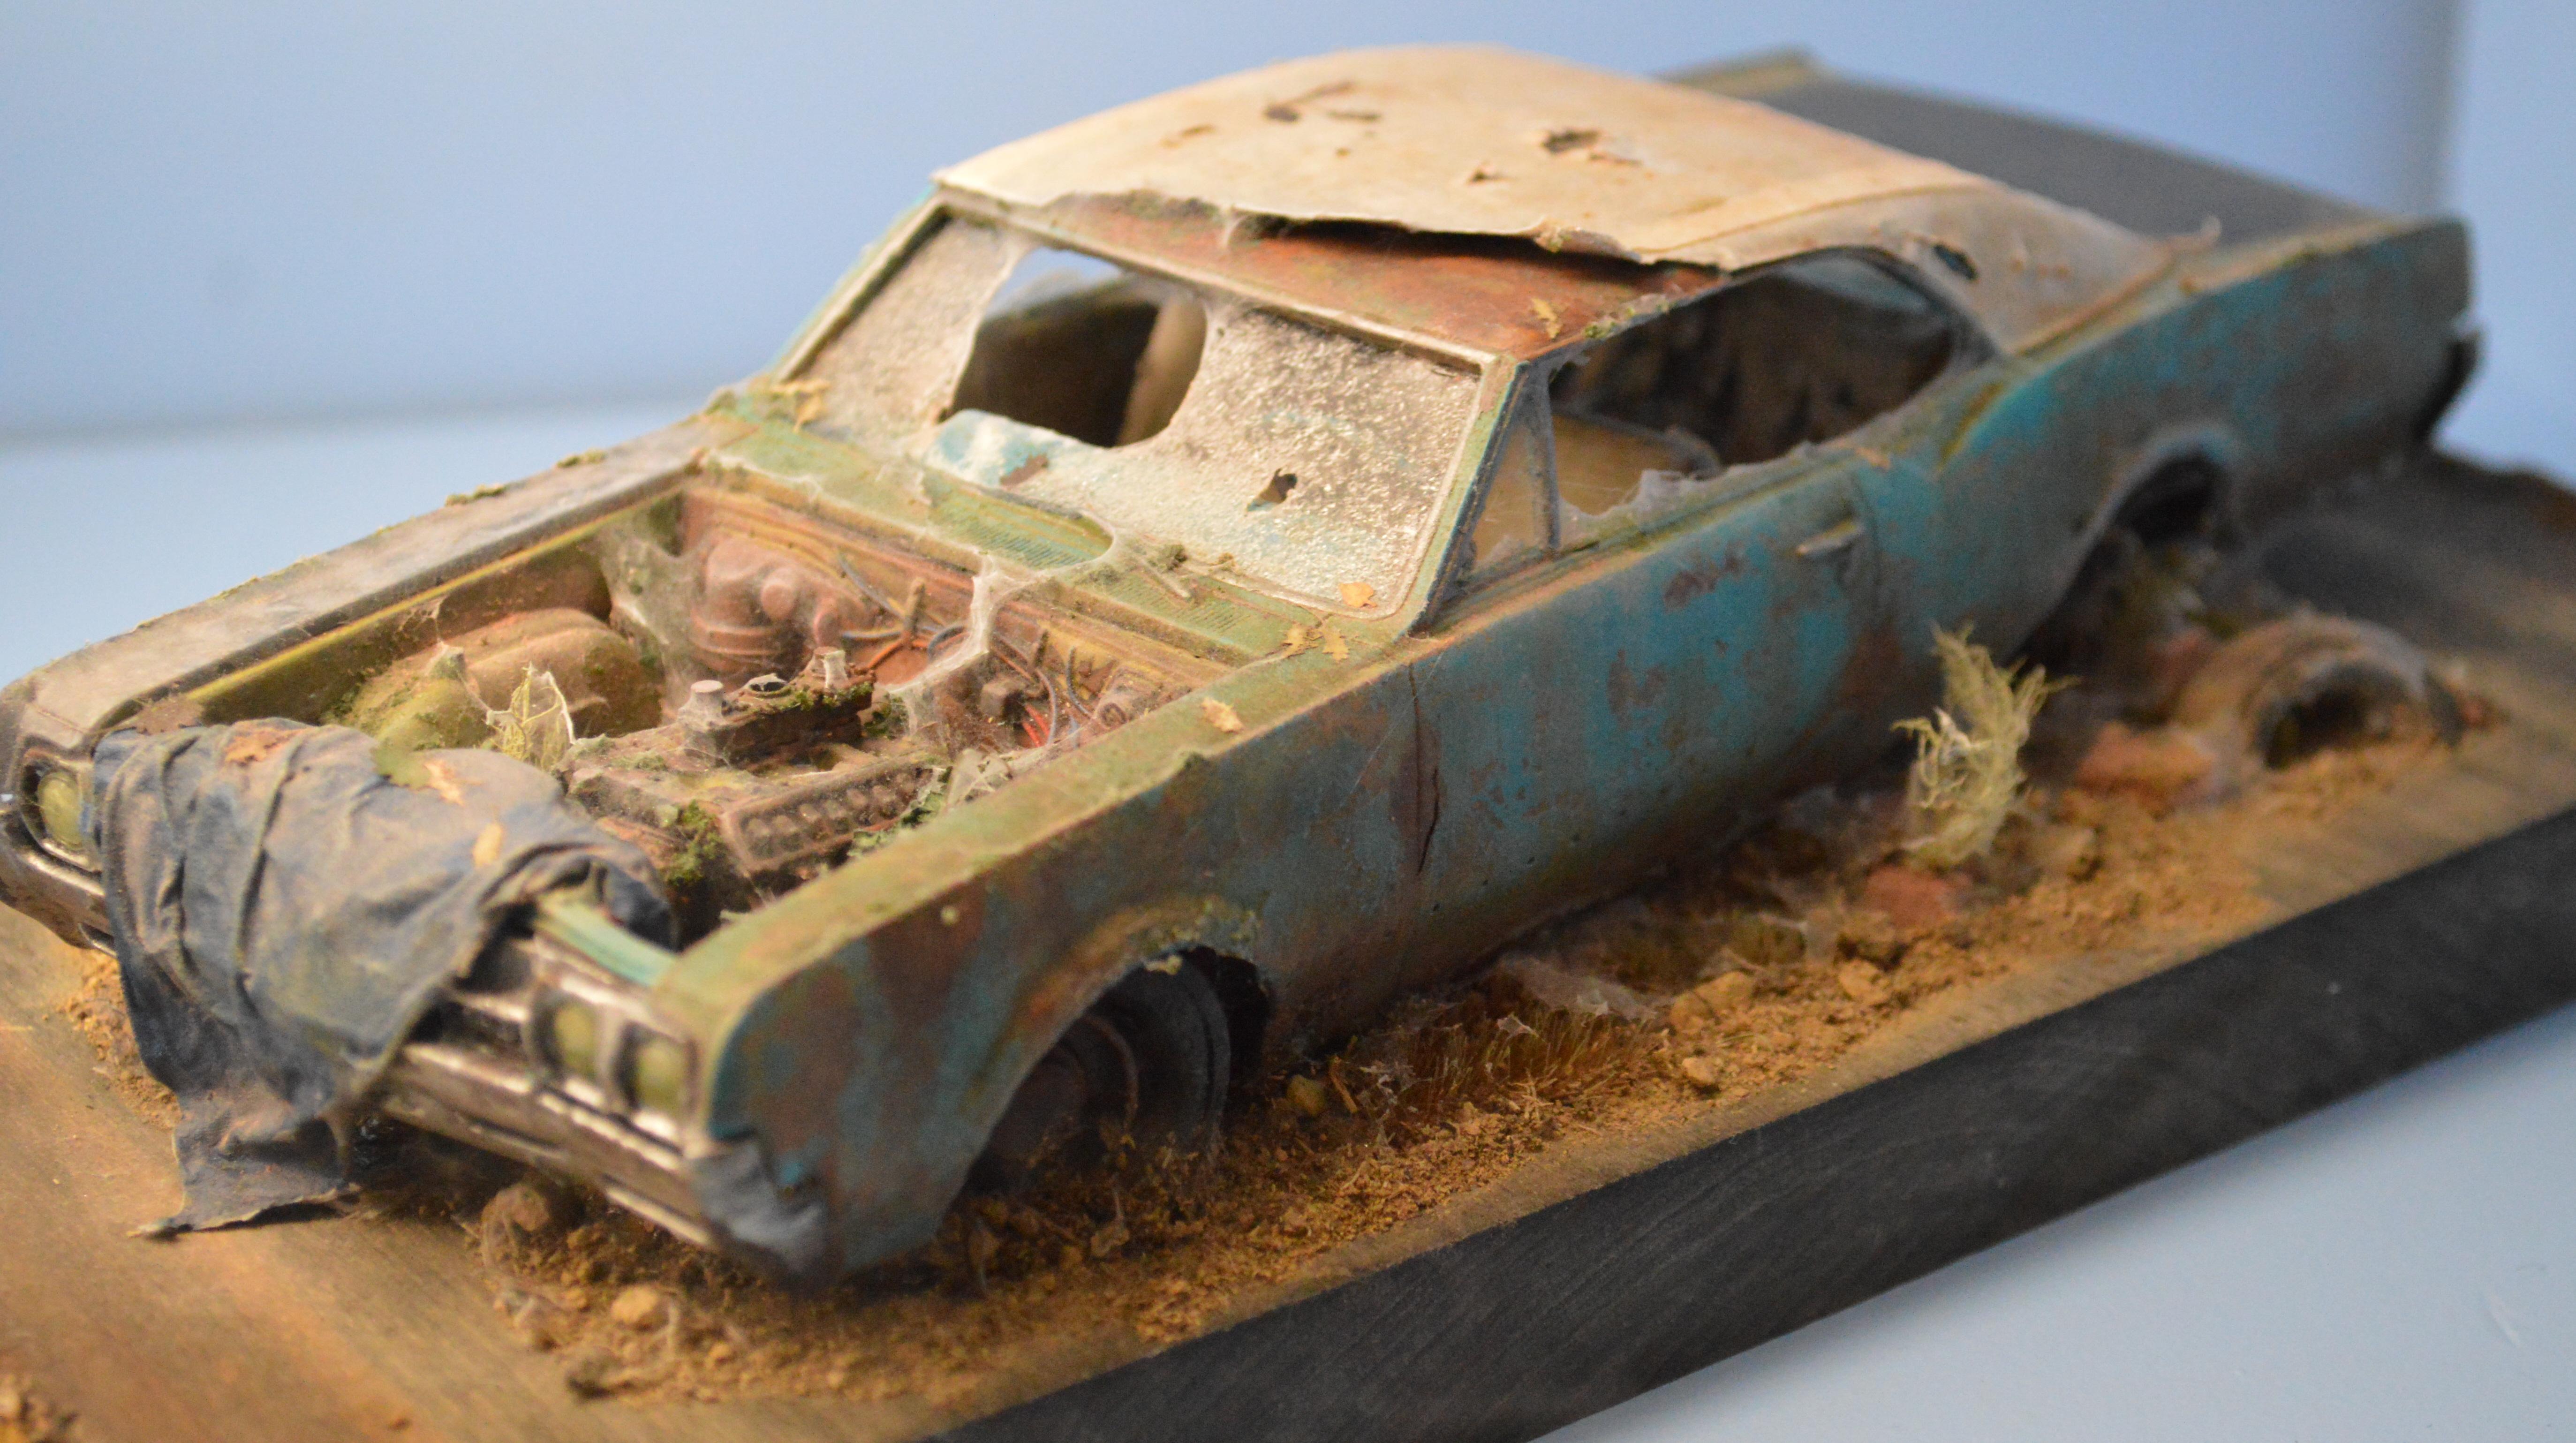 Adepticon 2014, Cars, Civilian, Crystal Brush, Wreck